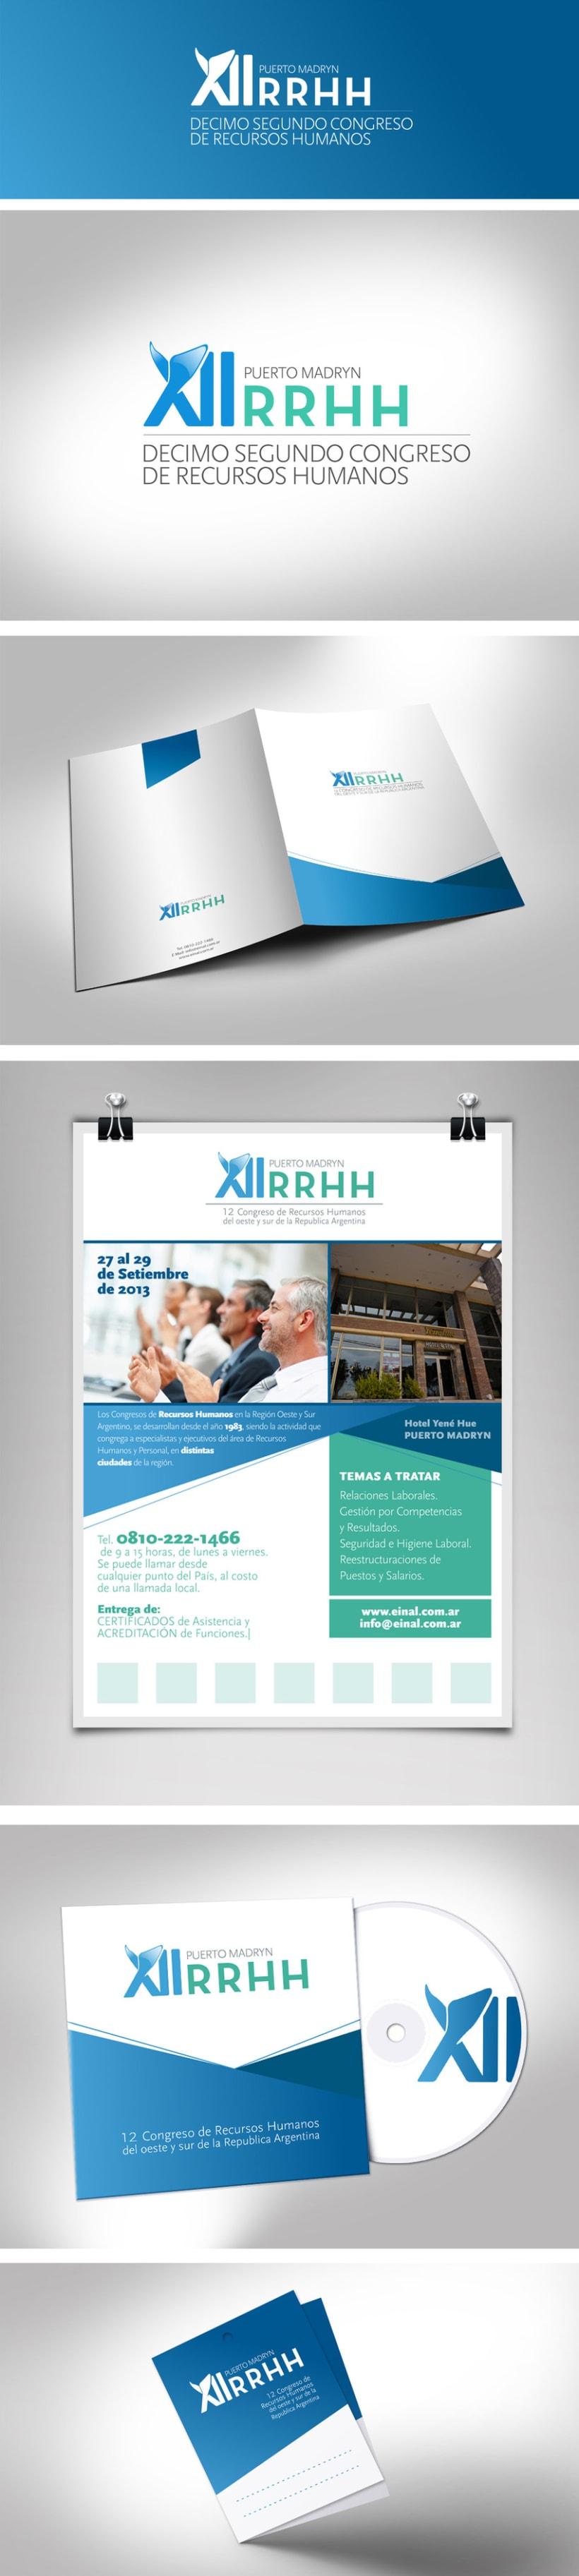 Congreso de RRHH (2013) 0